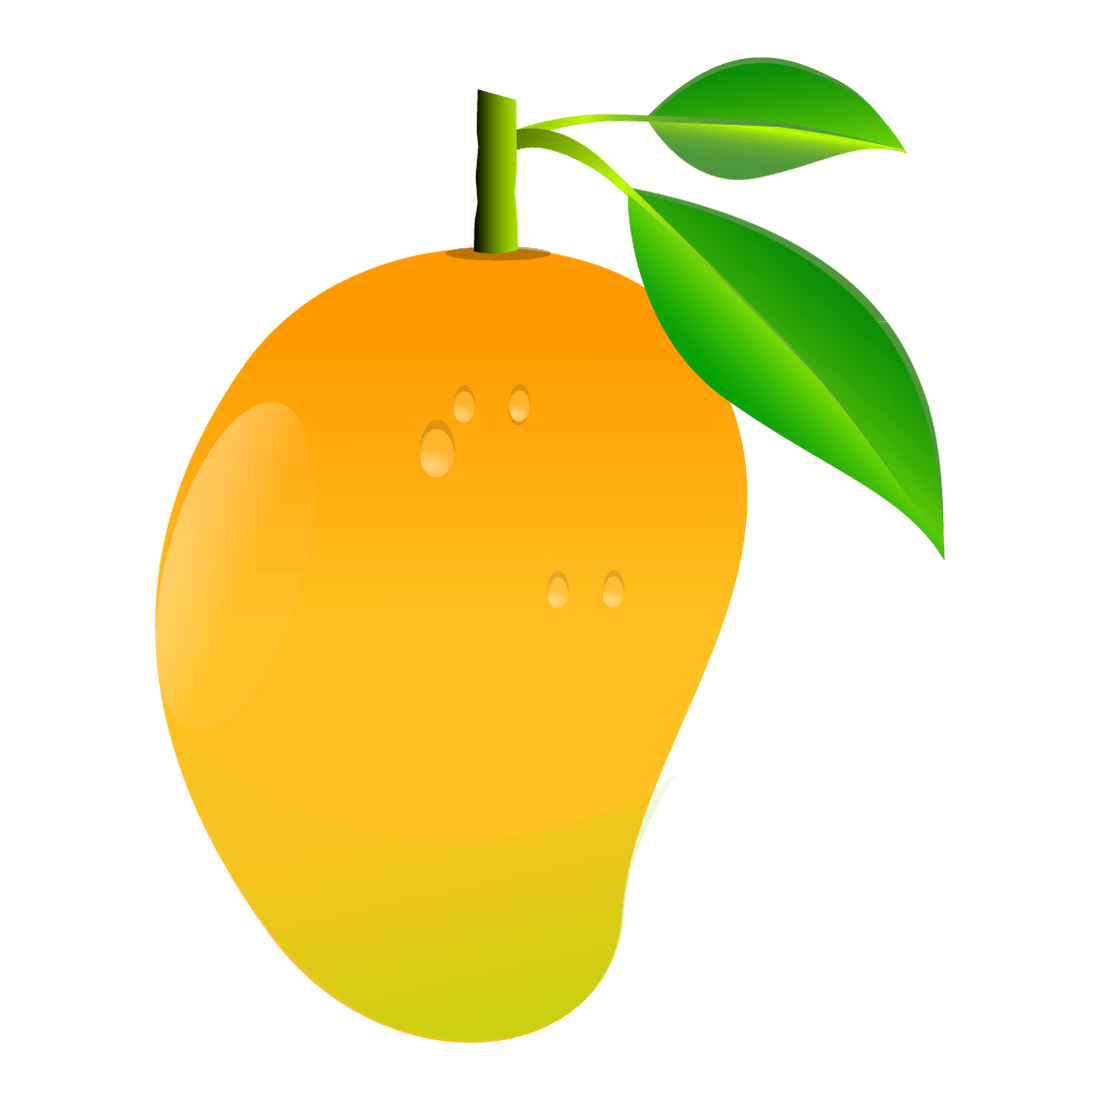 Mango Transparent Image